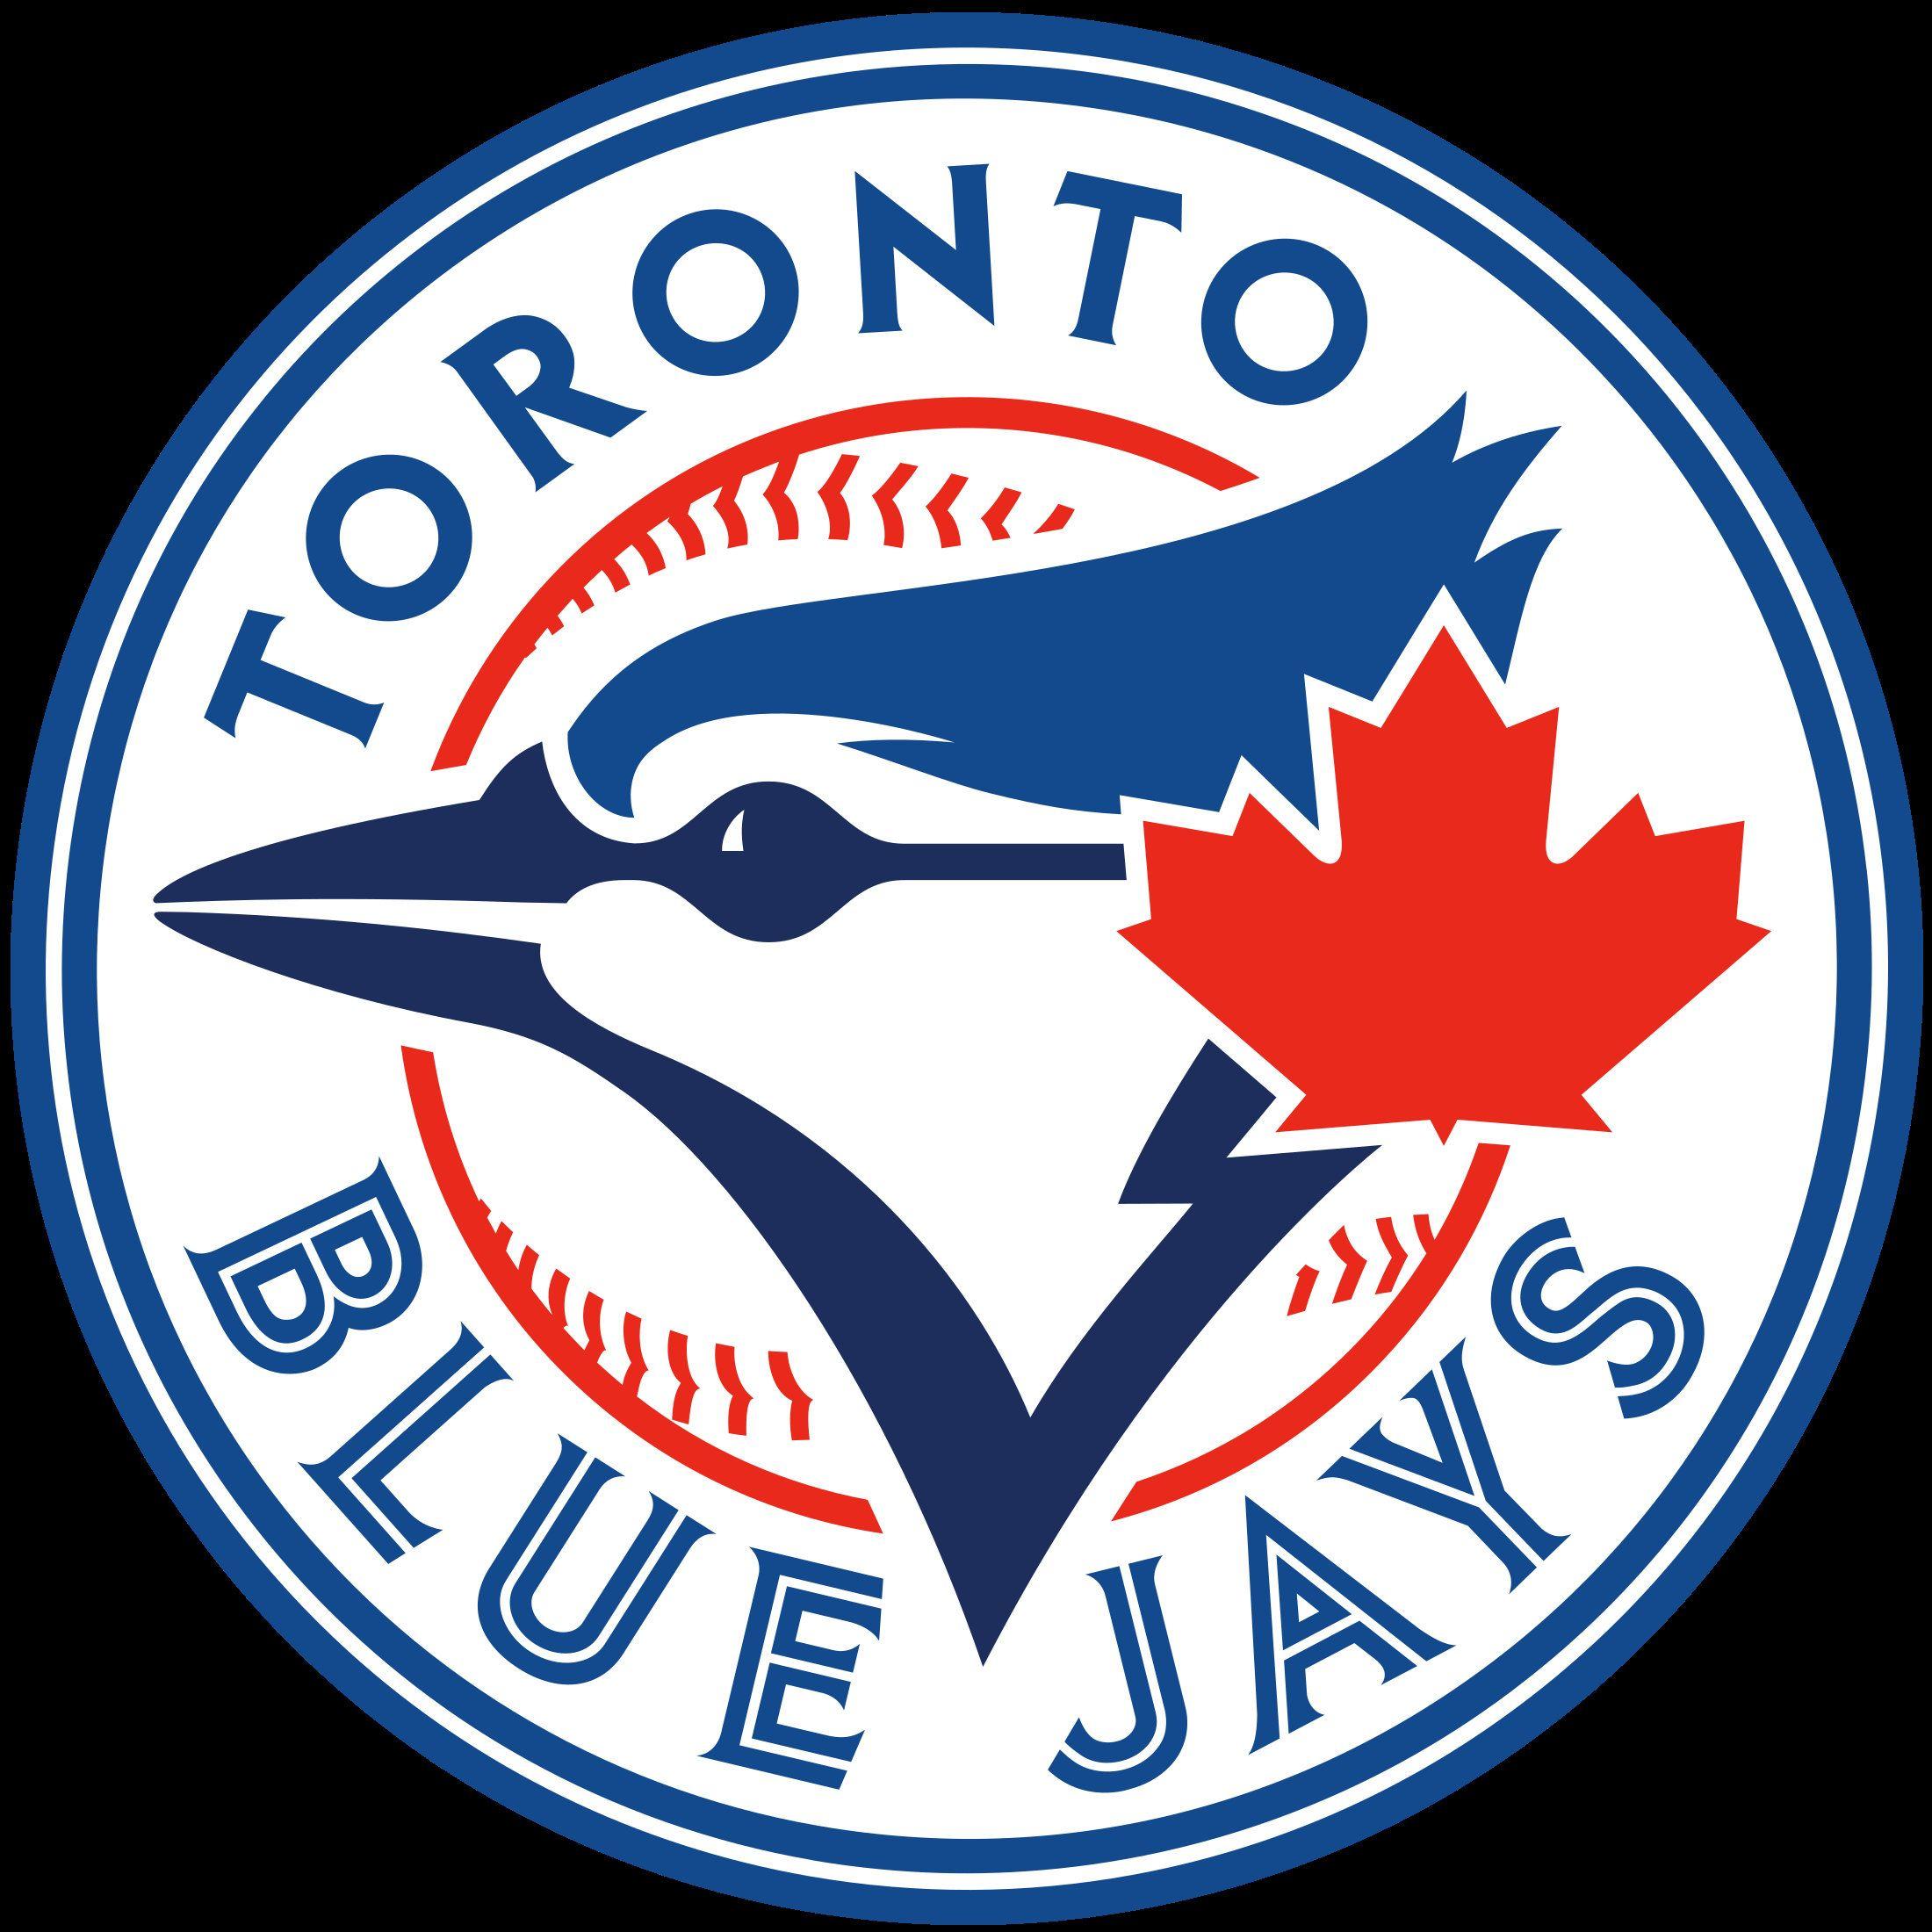 Toronto Blue Jays Mlb Logo Logo Svg Eps Png Jpg Pdf Etsy Toronto Blue Jays Logo Blue Jays Baseball Blue Jays Game